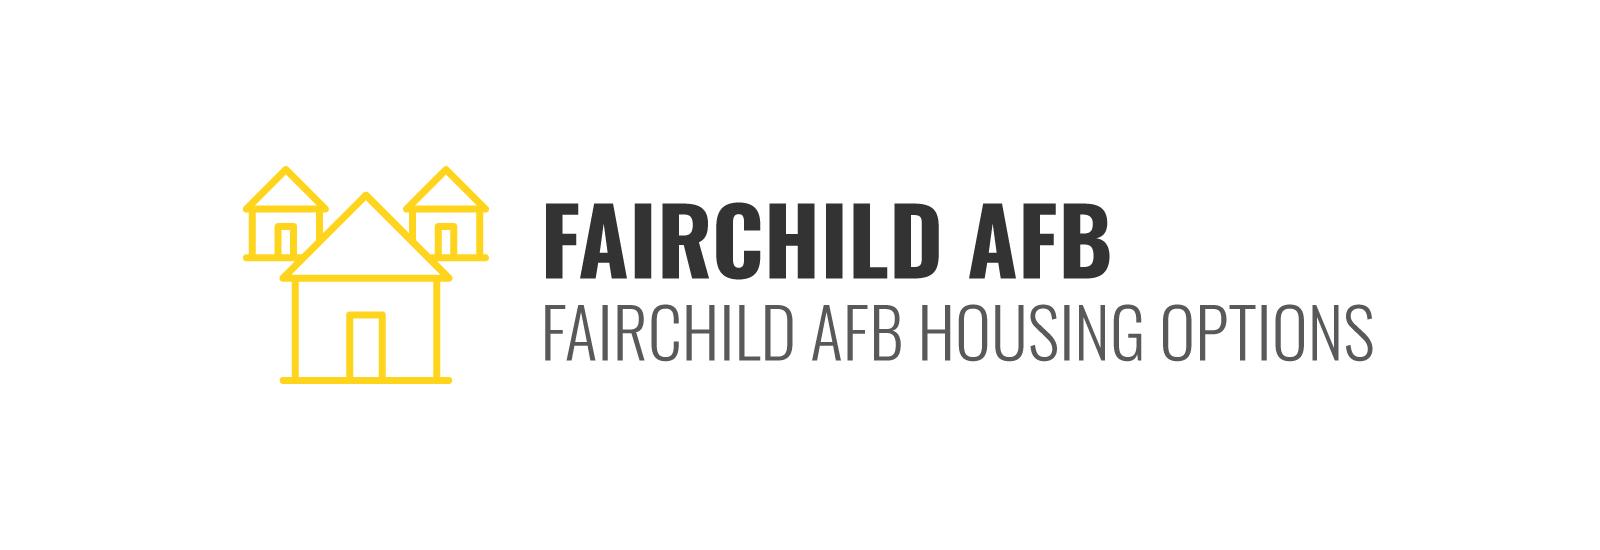 Fairchild AFB Housing Options